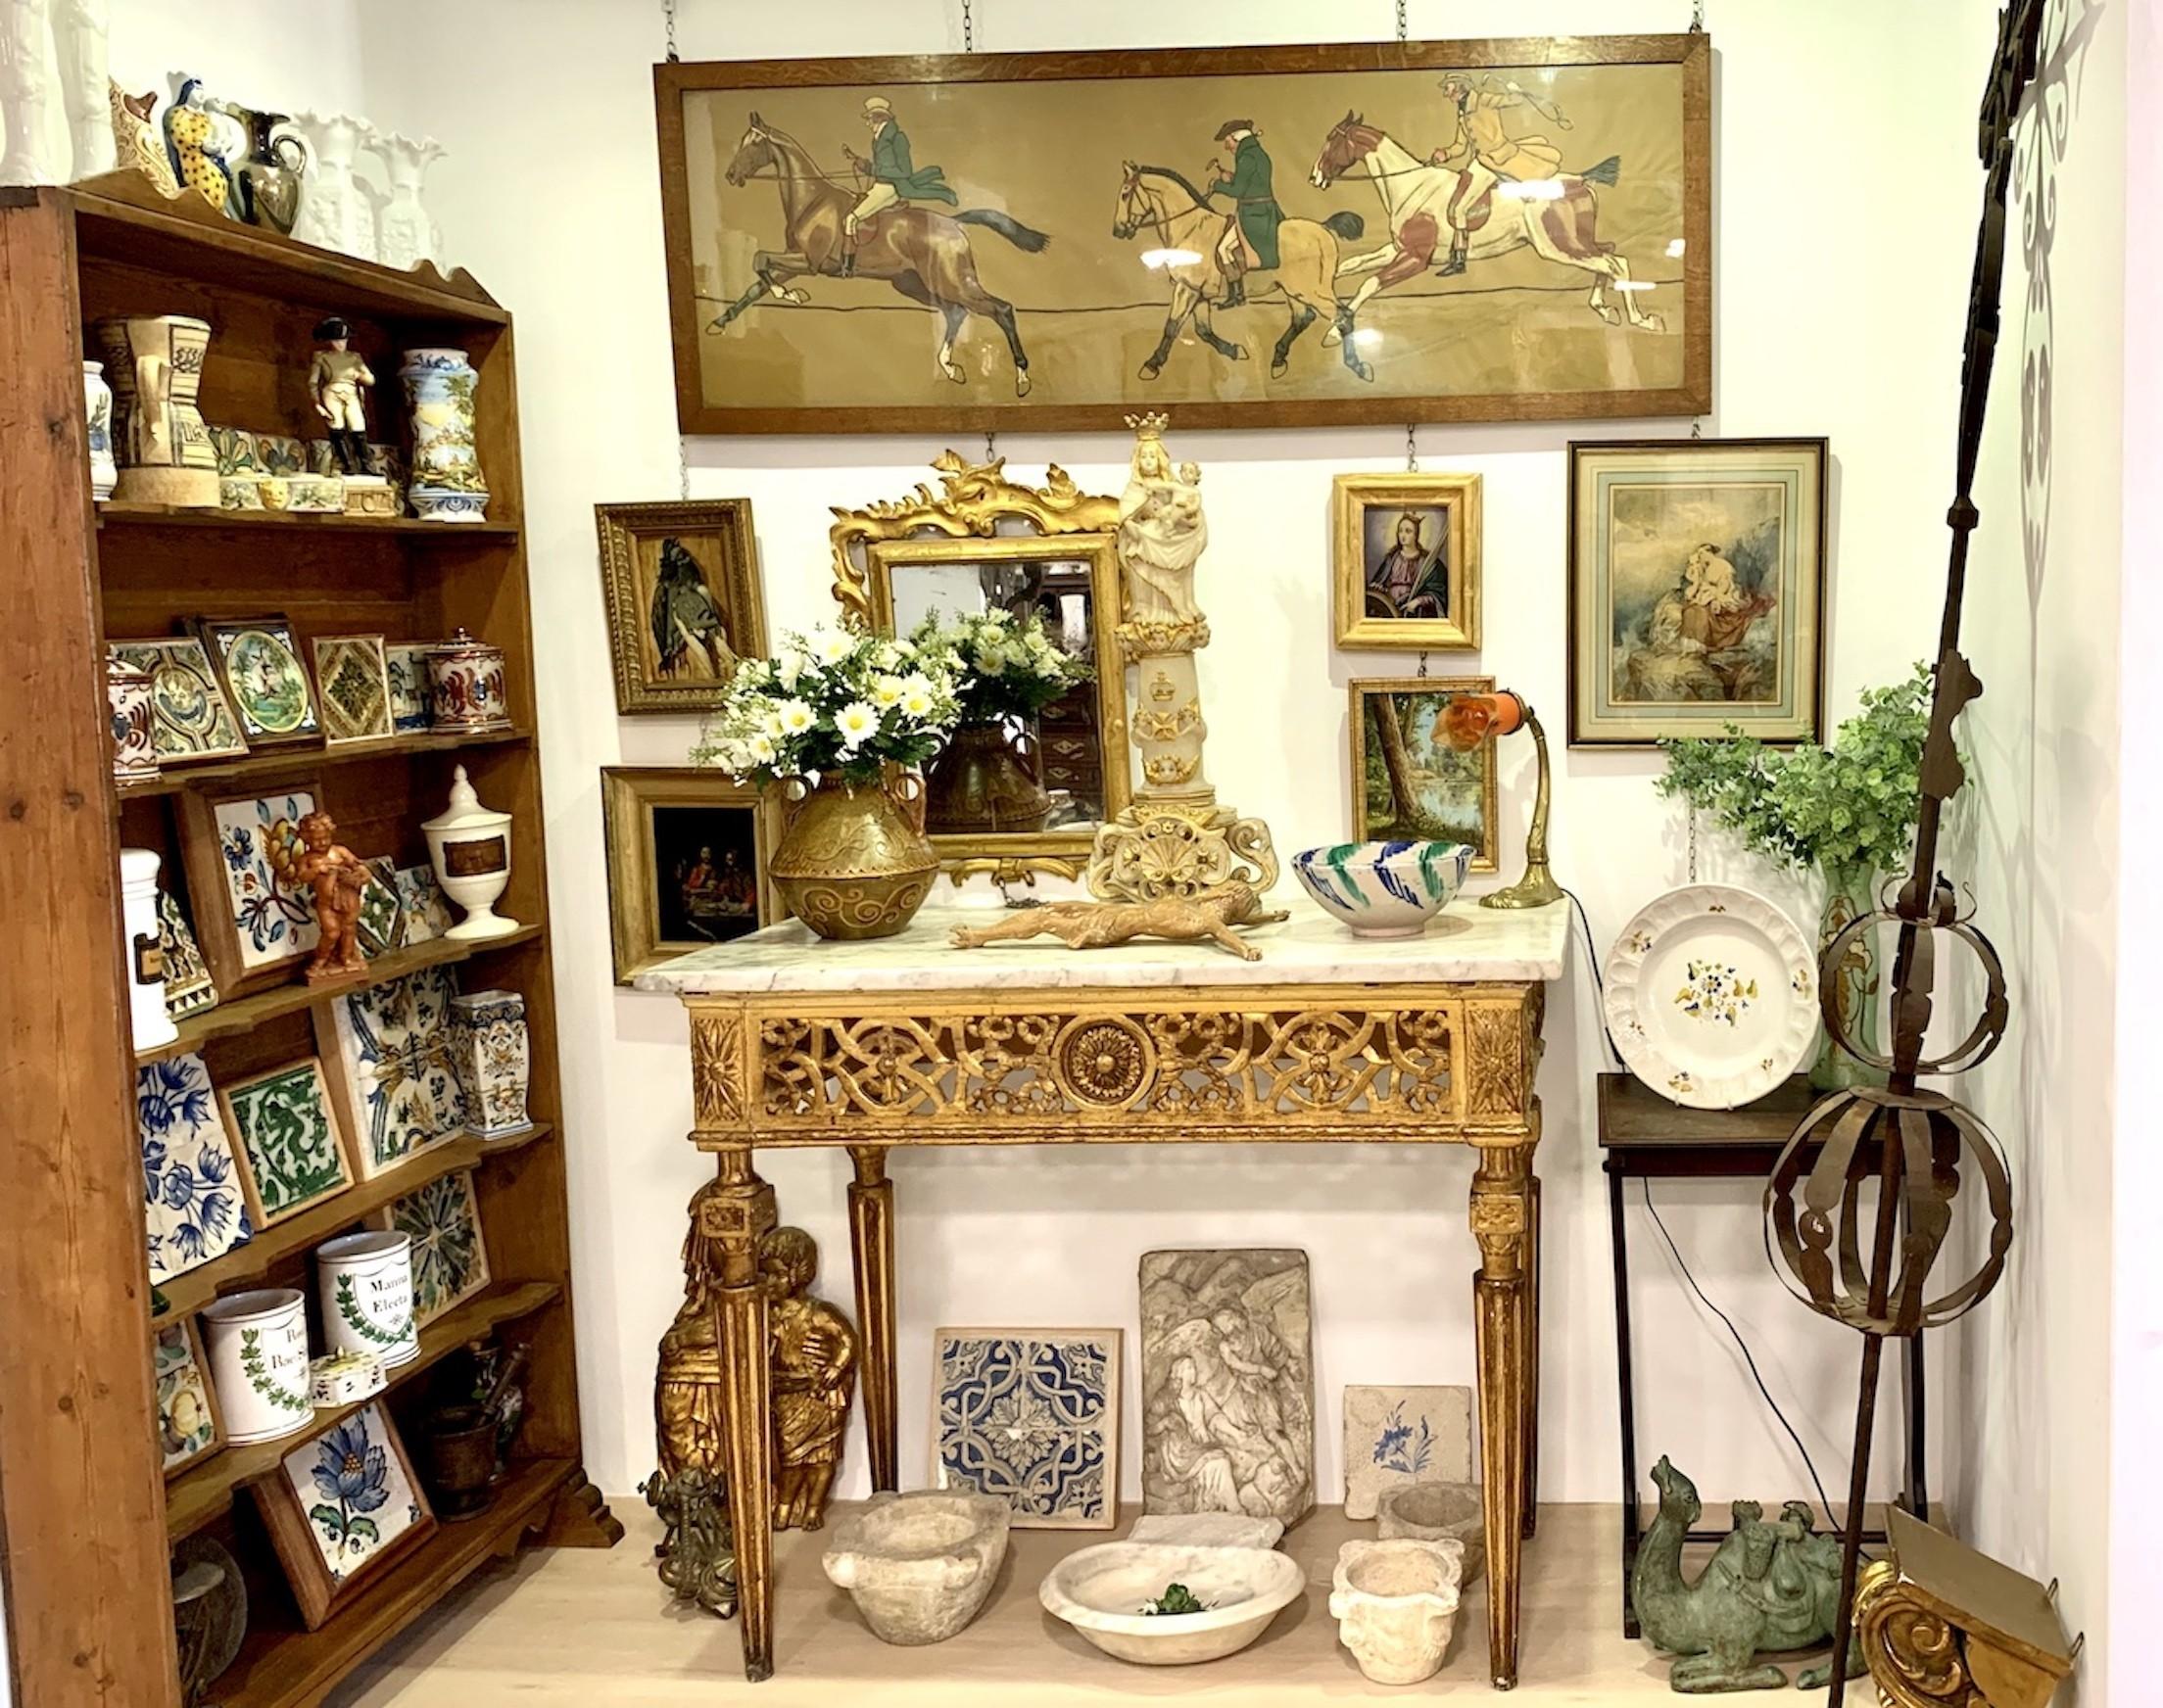 ANTIGUART venta de antigüedades